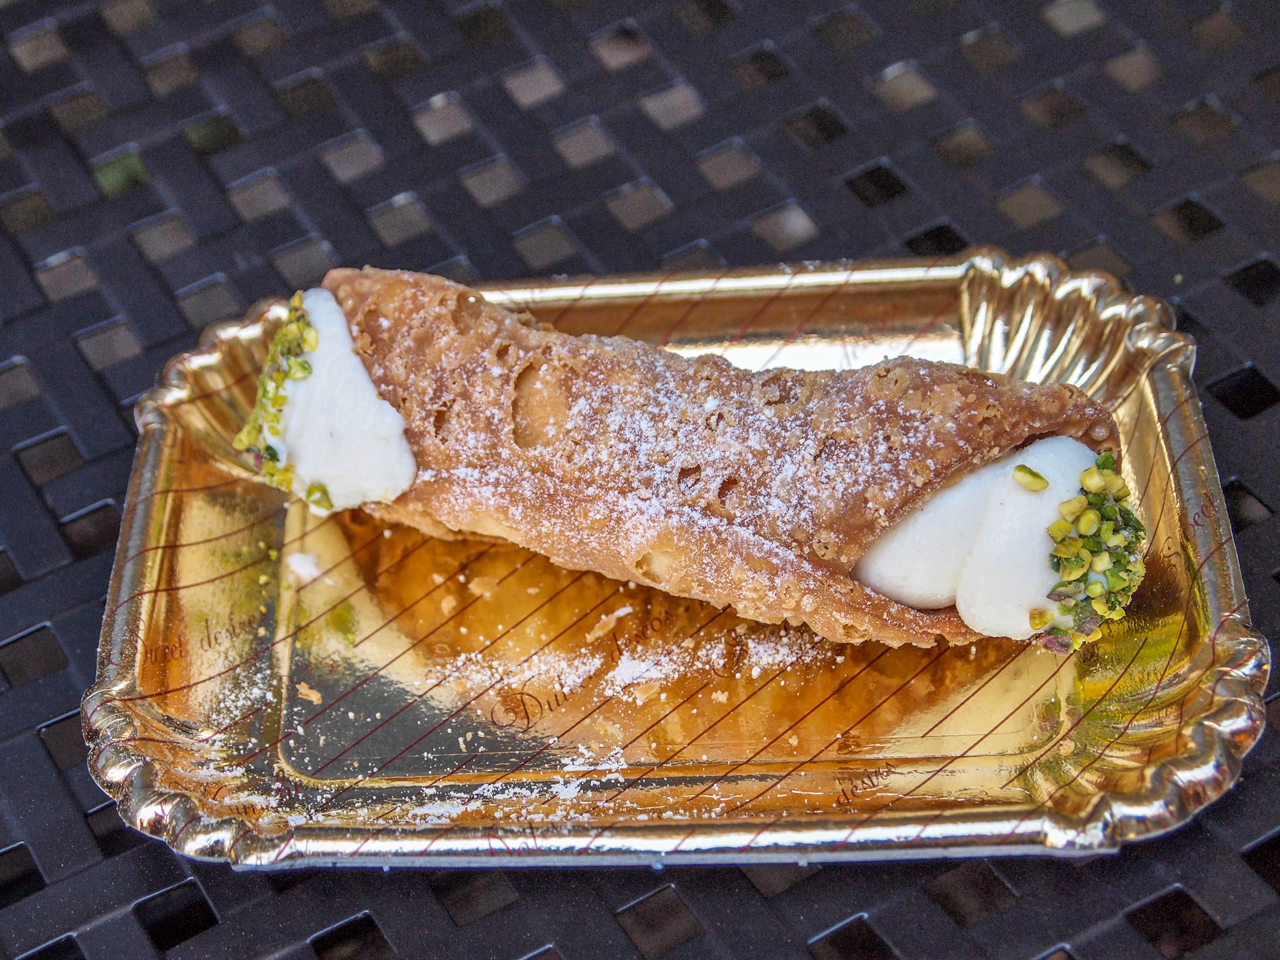 Cannoli for breakfast from Dolceria Bonajuto in Modica!